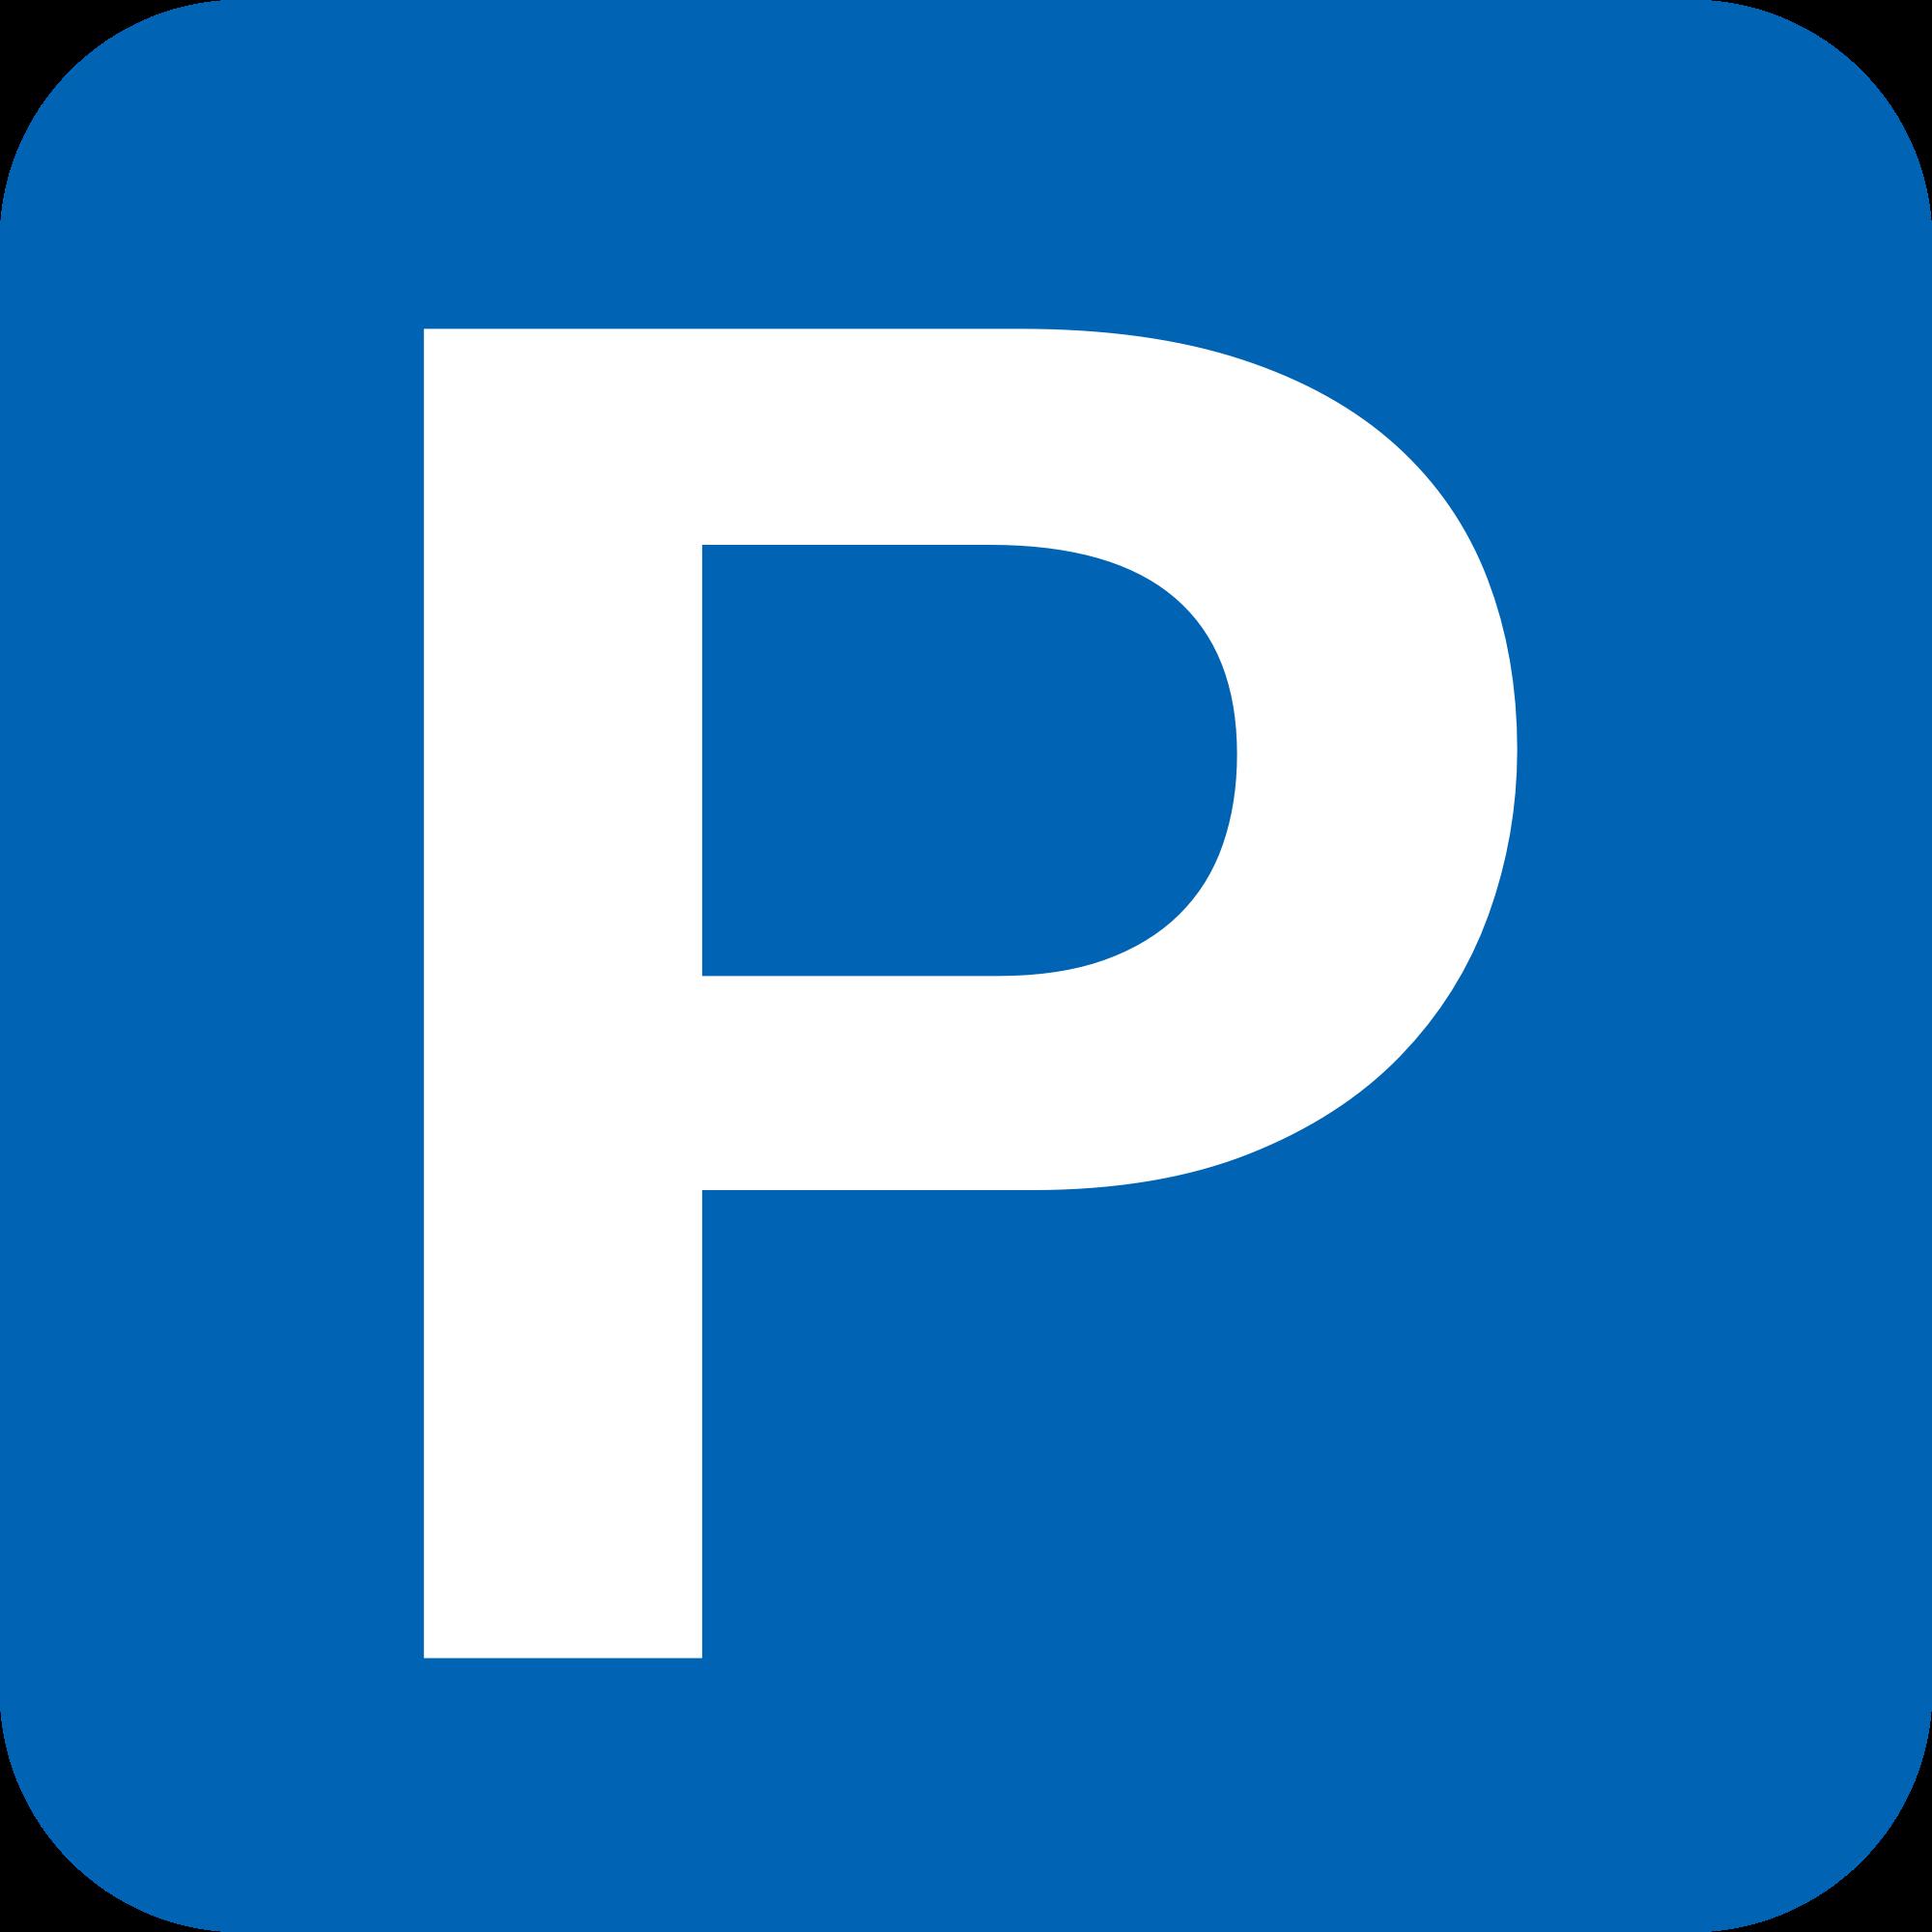 Šušnjevica – mogućnost parkiranja